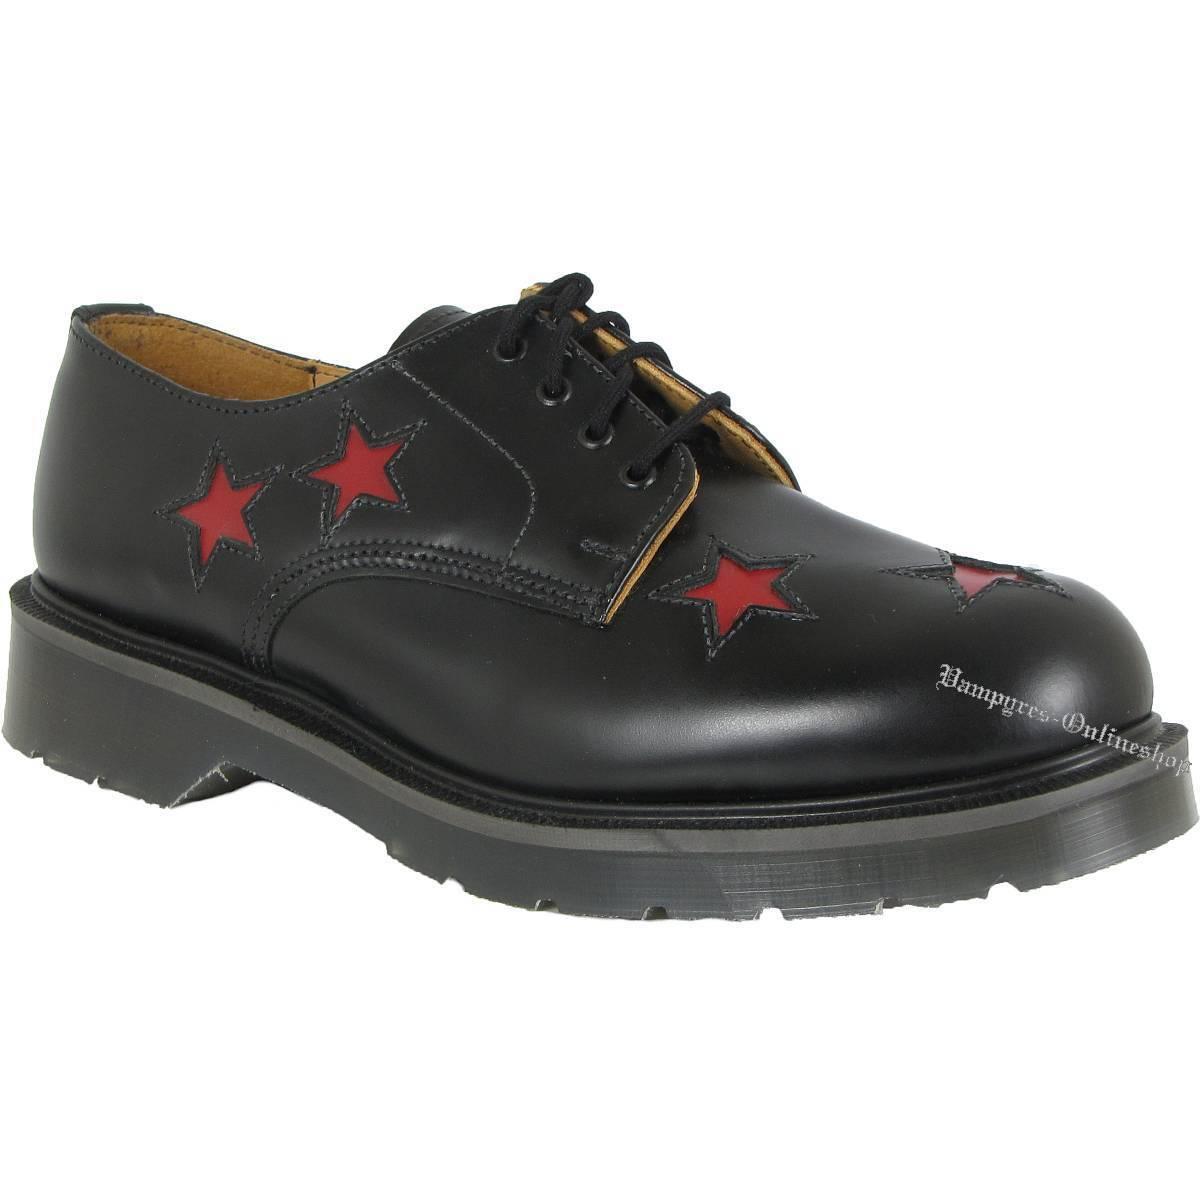 Solovair 4-Loch ROT Star 14-1 Schuhe Schwarz Rote Sterne Leder Halbschuhe Noir